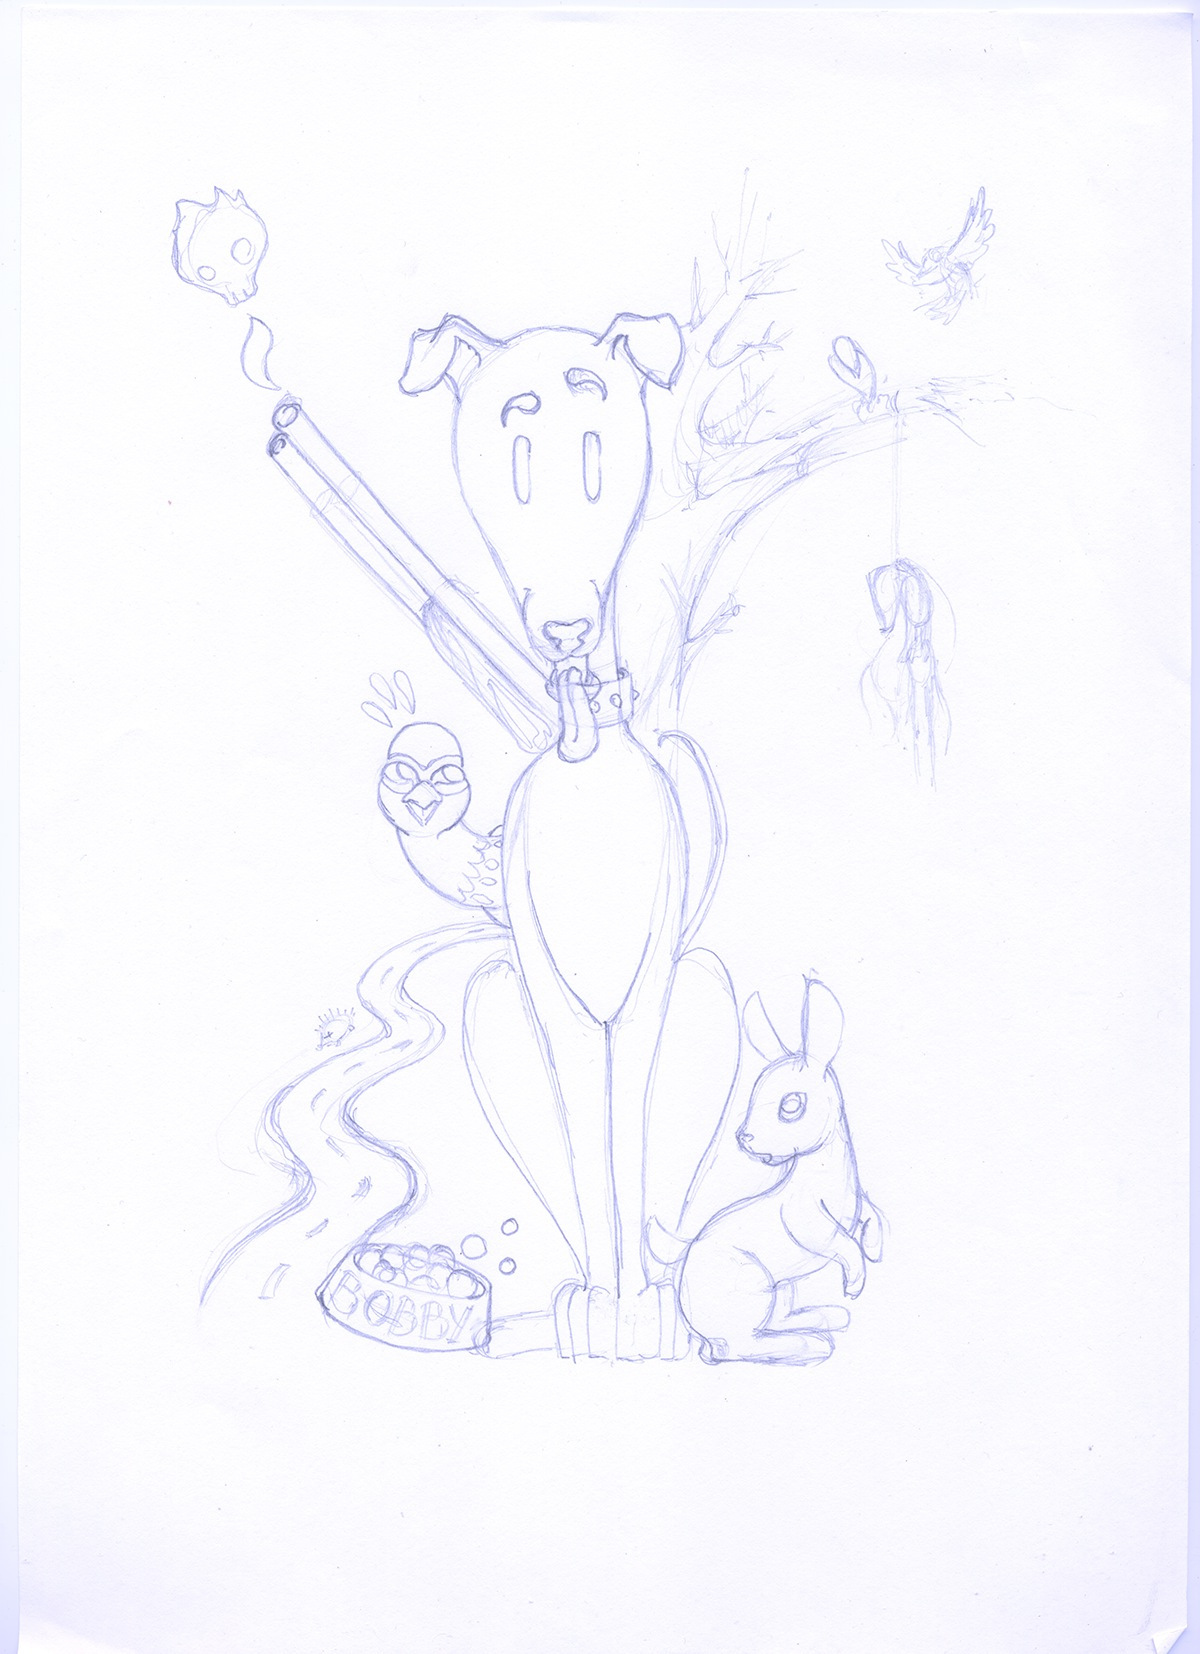 ilustracion dibujo boceto scketch photoshop Illustrator